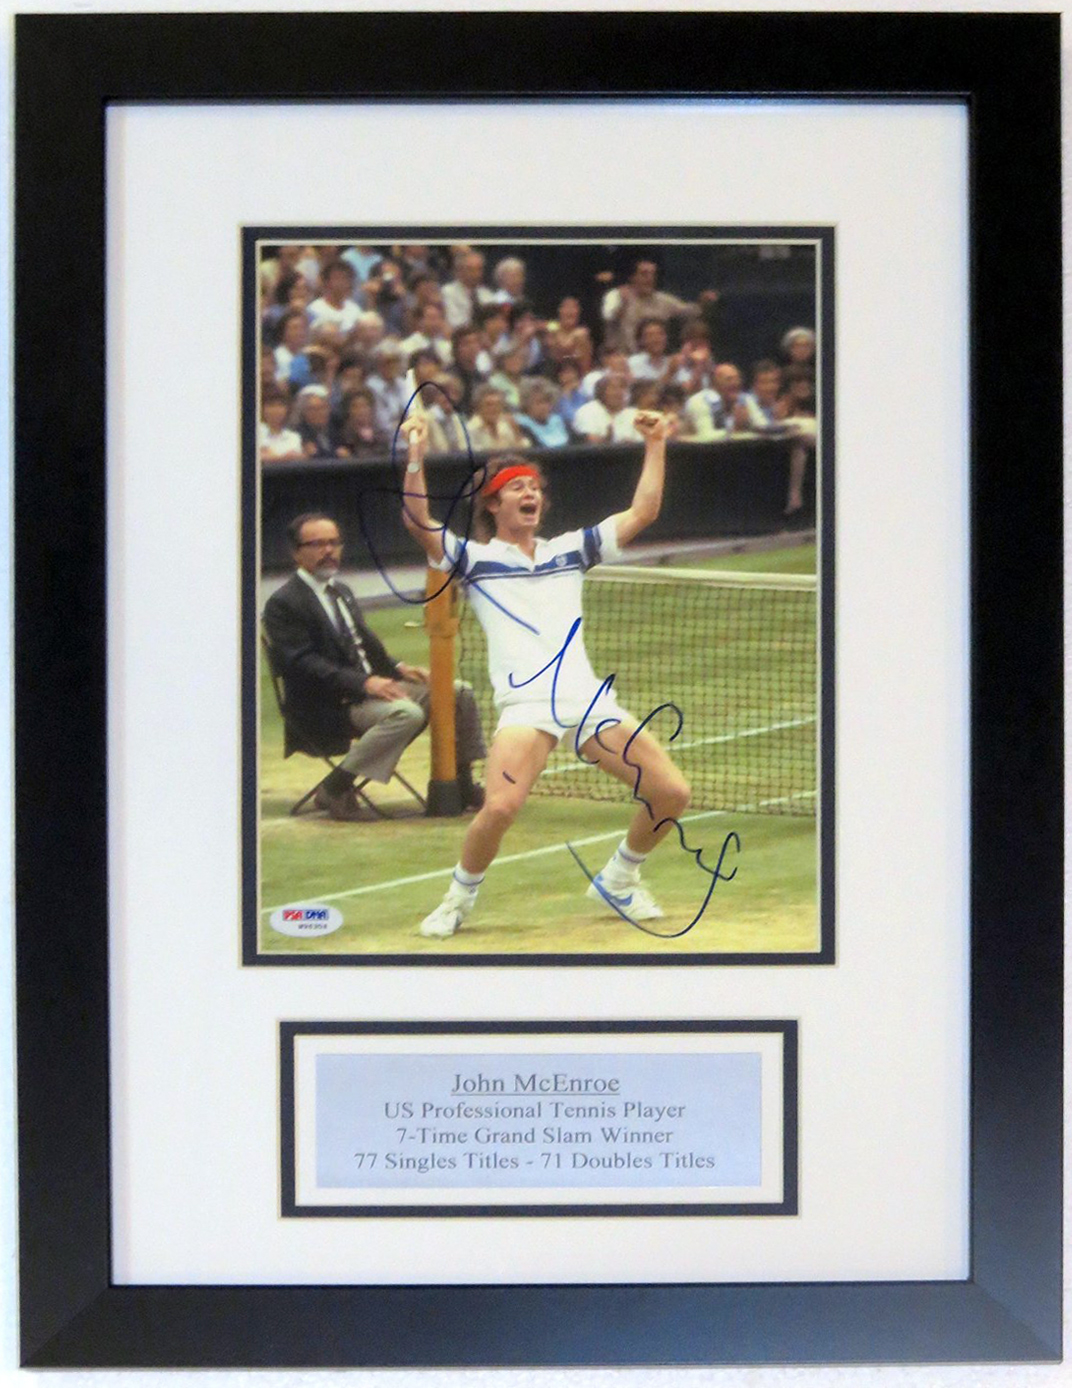 John McEnroe Signed Wimbledon 8x10 Photo - PSA DNA COA Authenticated - Custom Framed & Plate